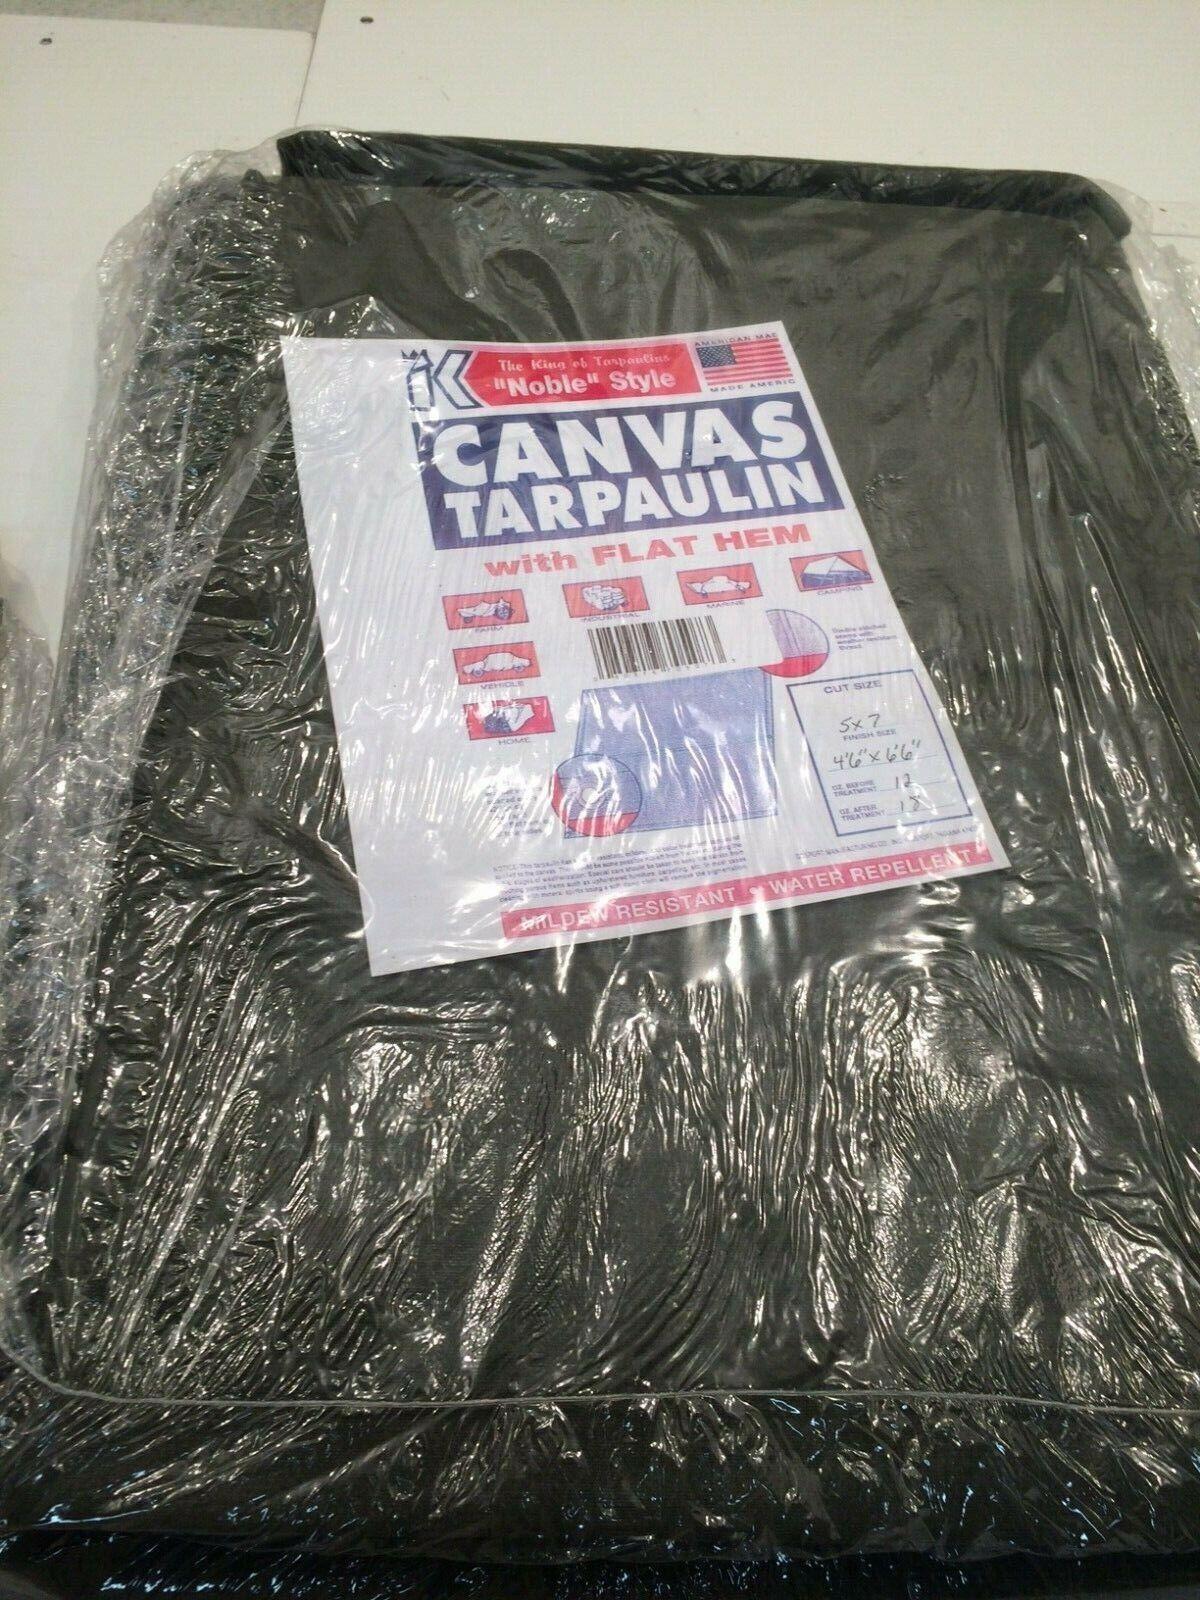 King Canvas Tarpaulin w/ Gromments 12oz/18oz Heavy Duty Canvas Tarp (5'x7') (B3)